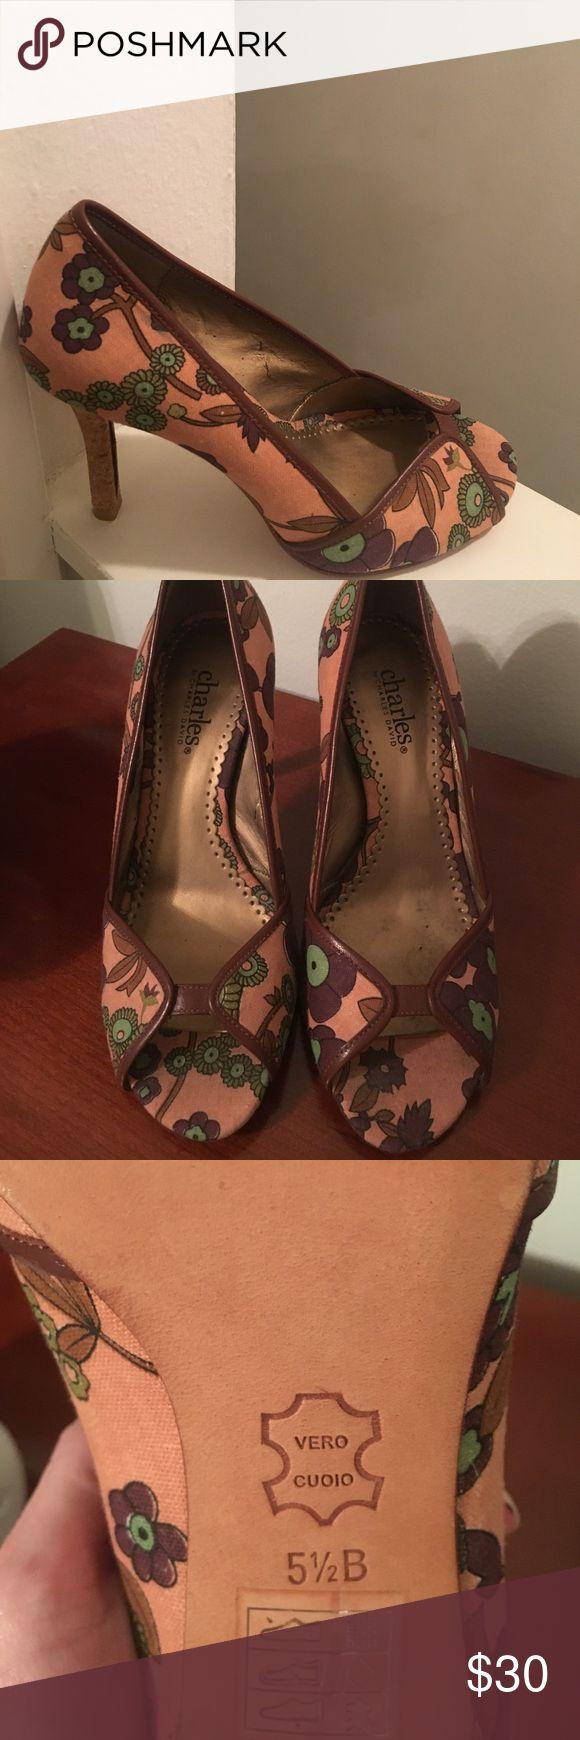 Charles David heels Great condition Charles David Shoes Heels